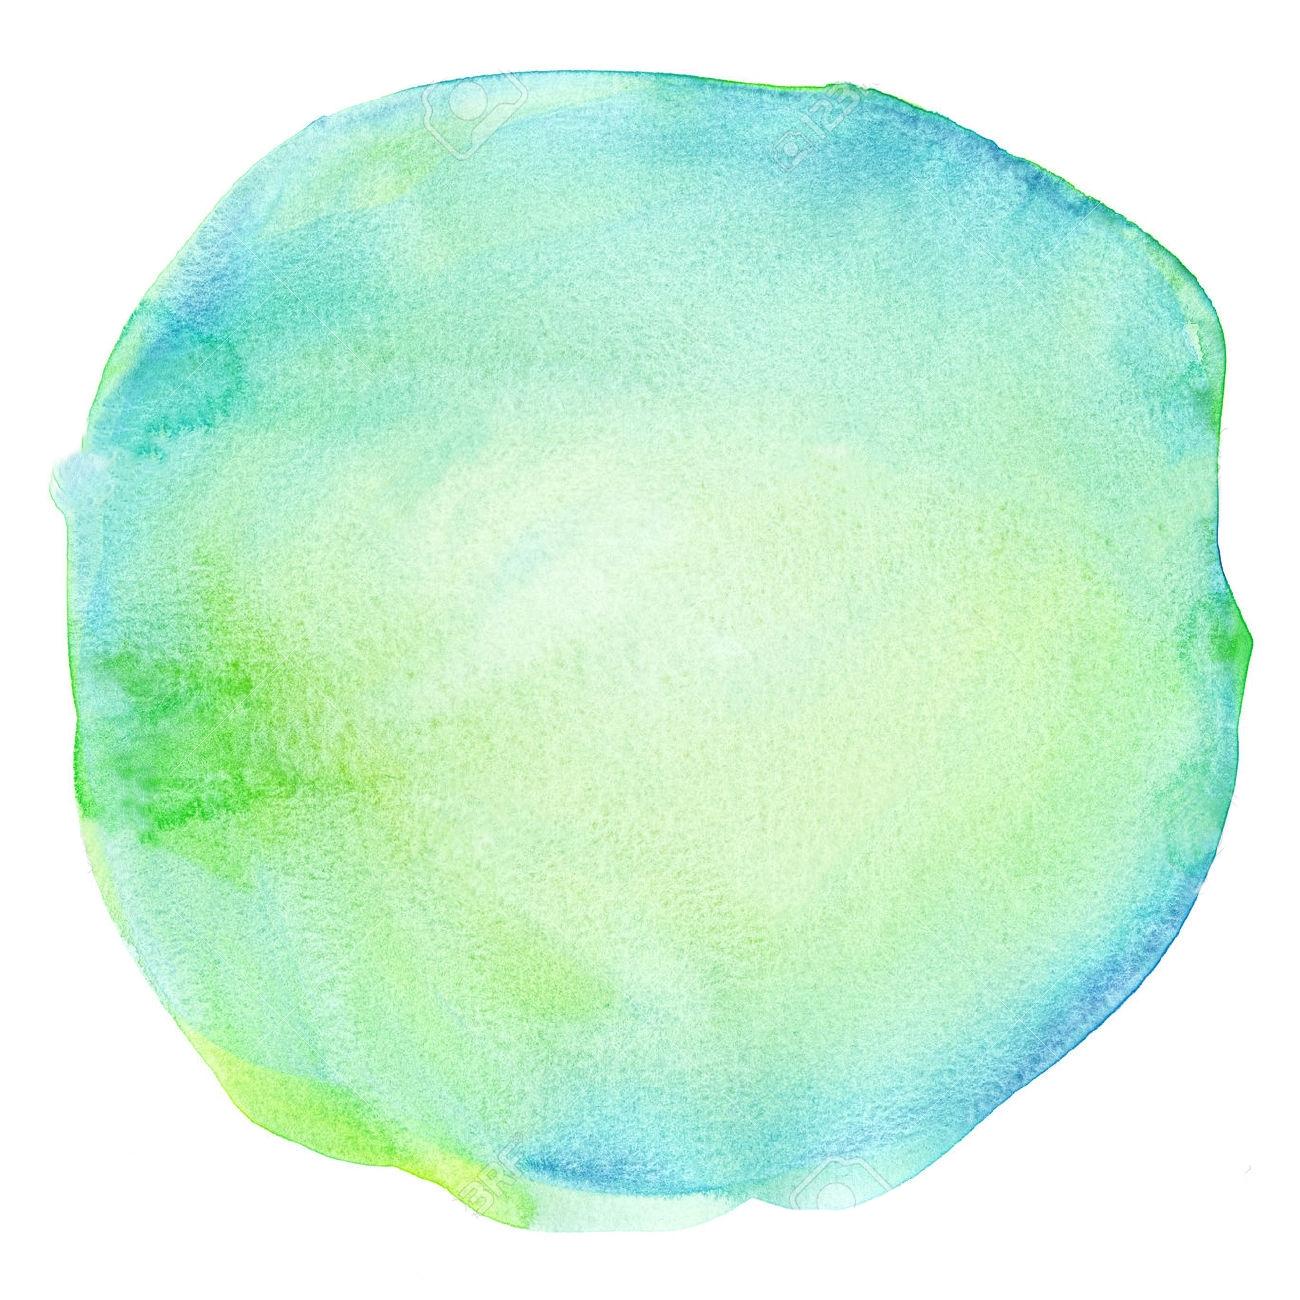 27254245-Blue-watercolor-brush-stroke-splash-circle-Design-element-Stock-Photo.jpg